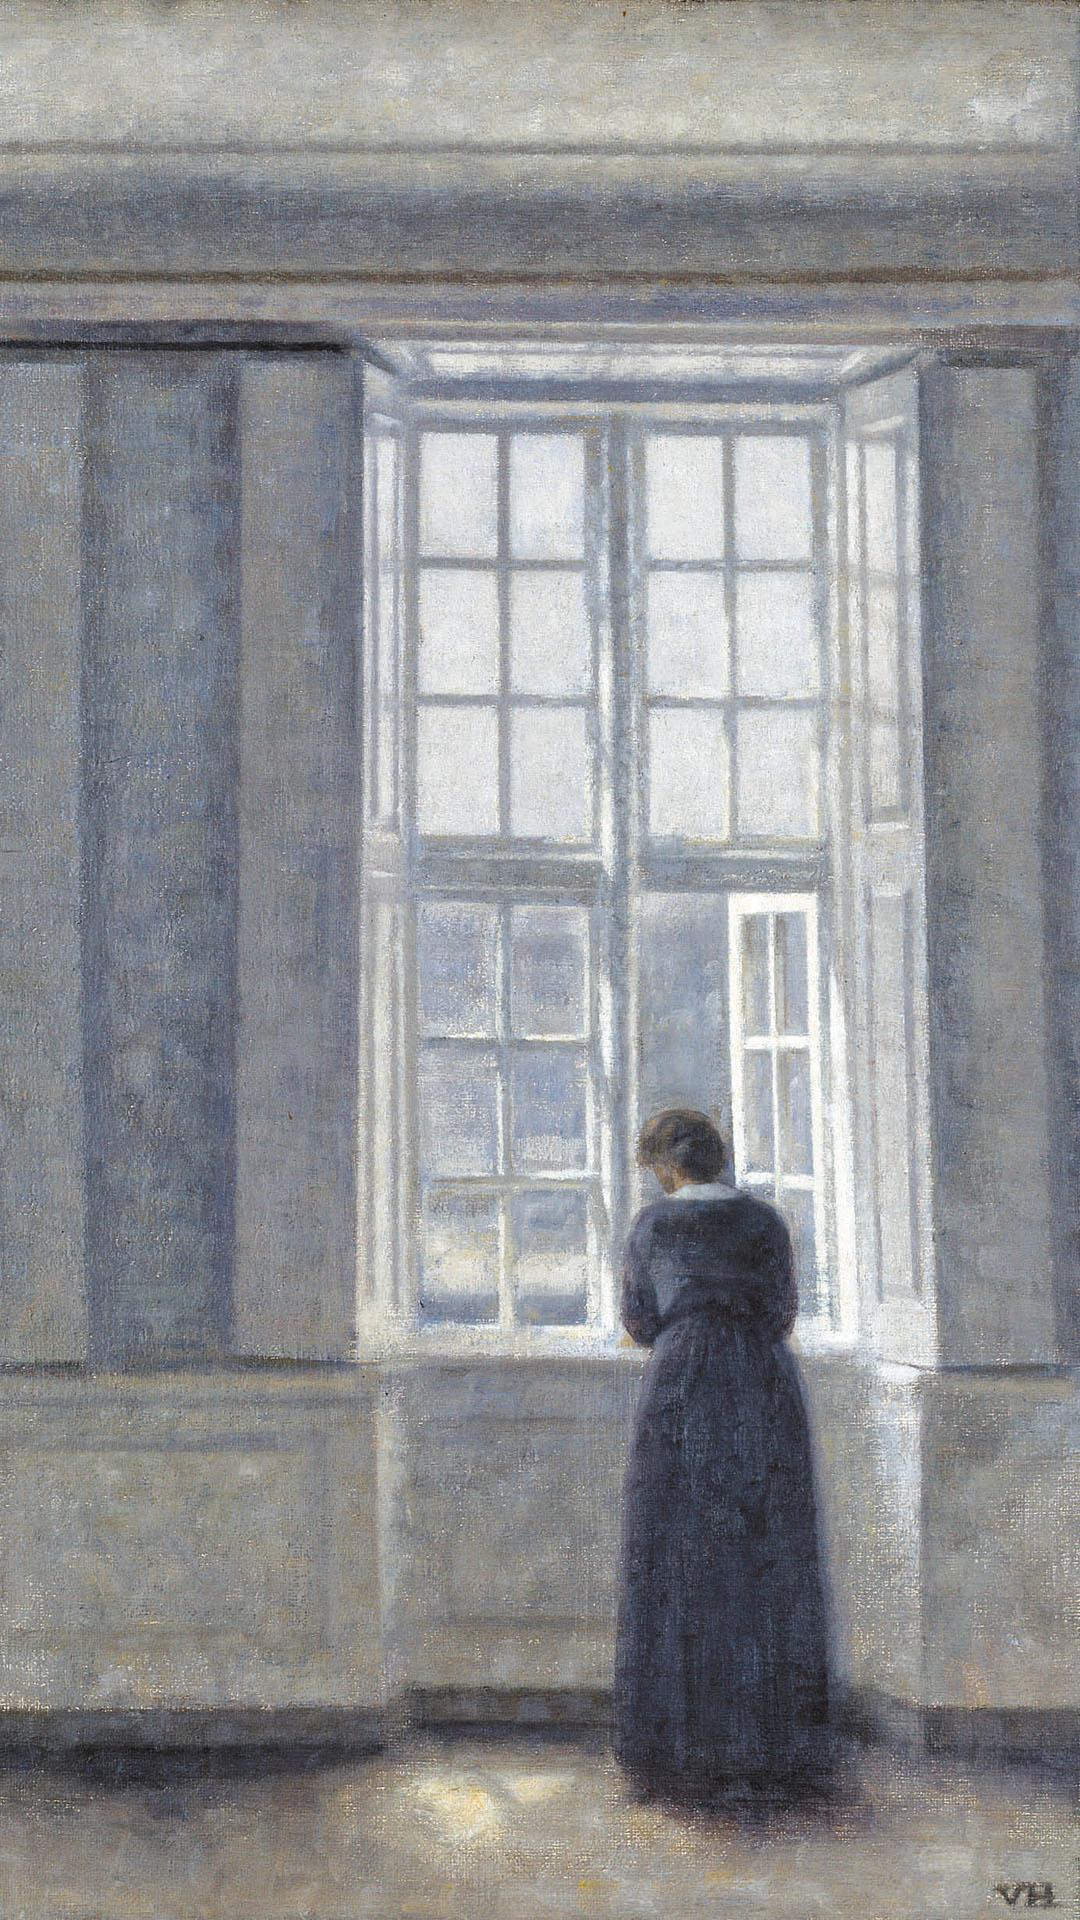 Vilhelm Hammershoi - Tall windows 1080x1920